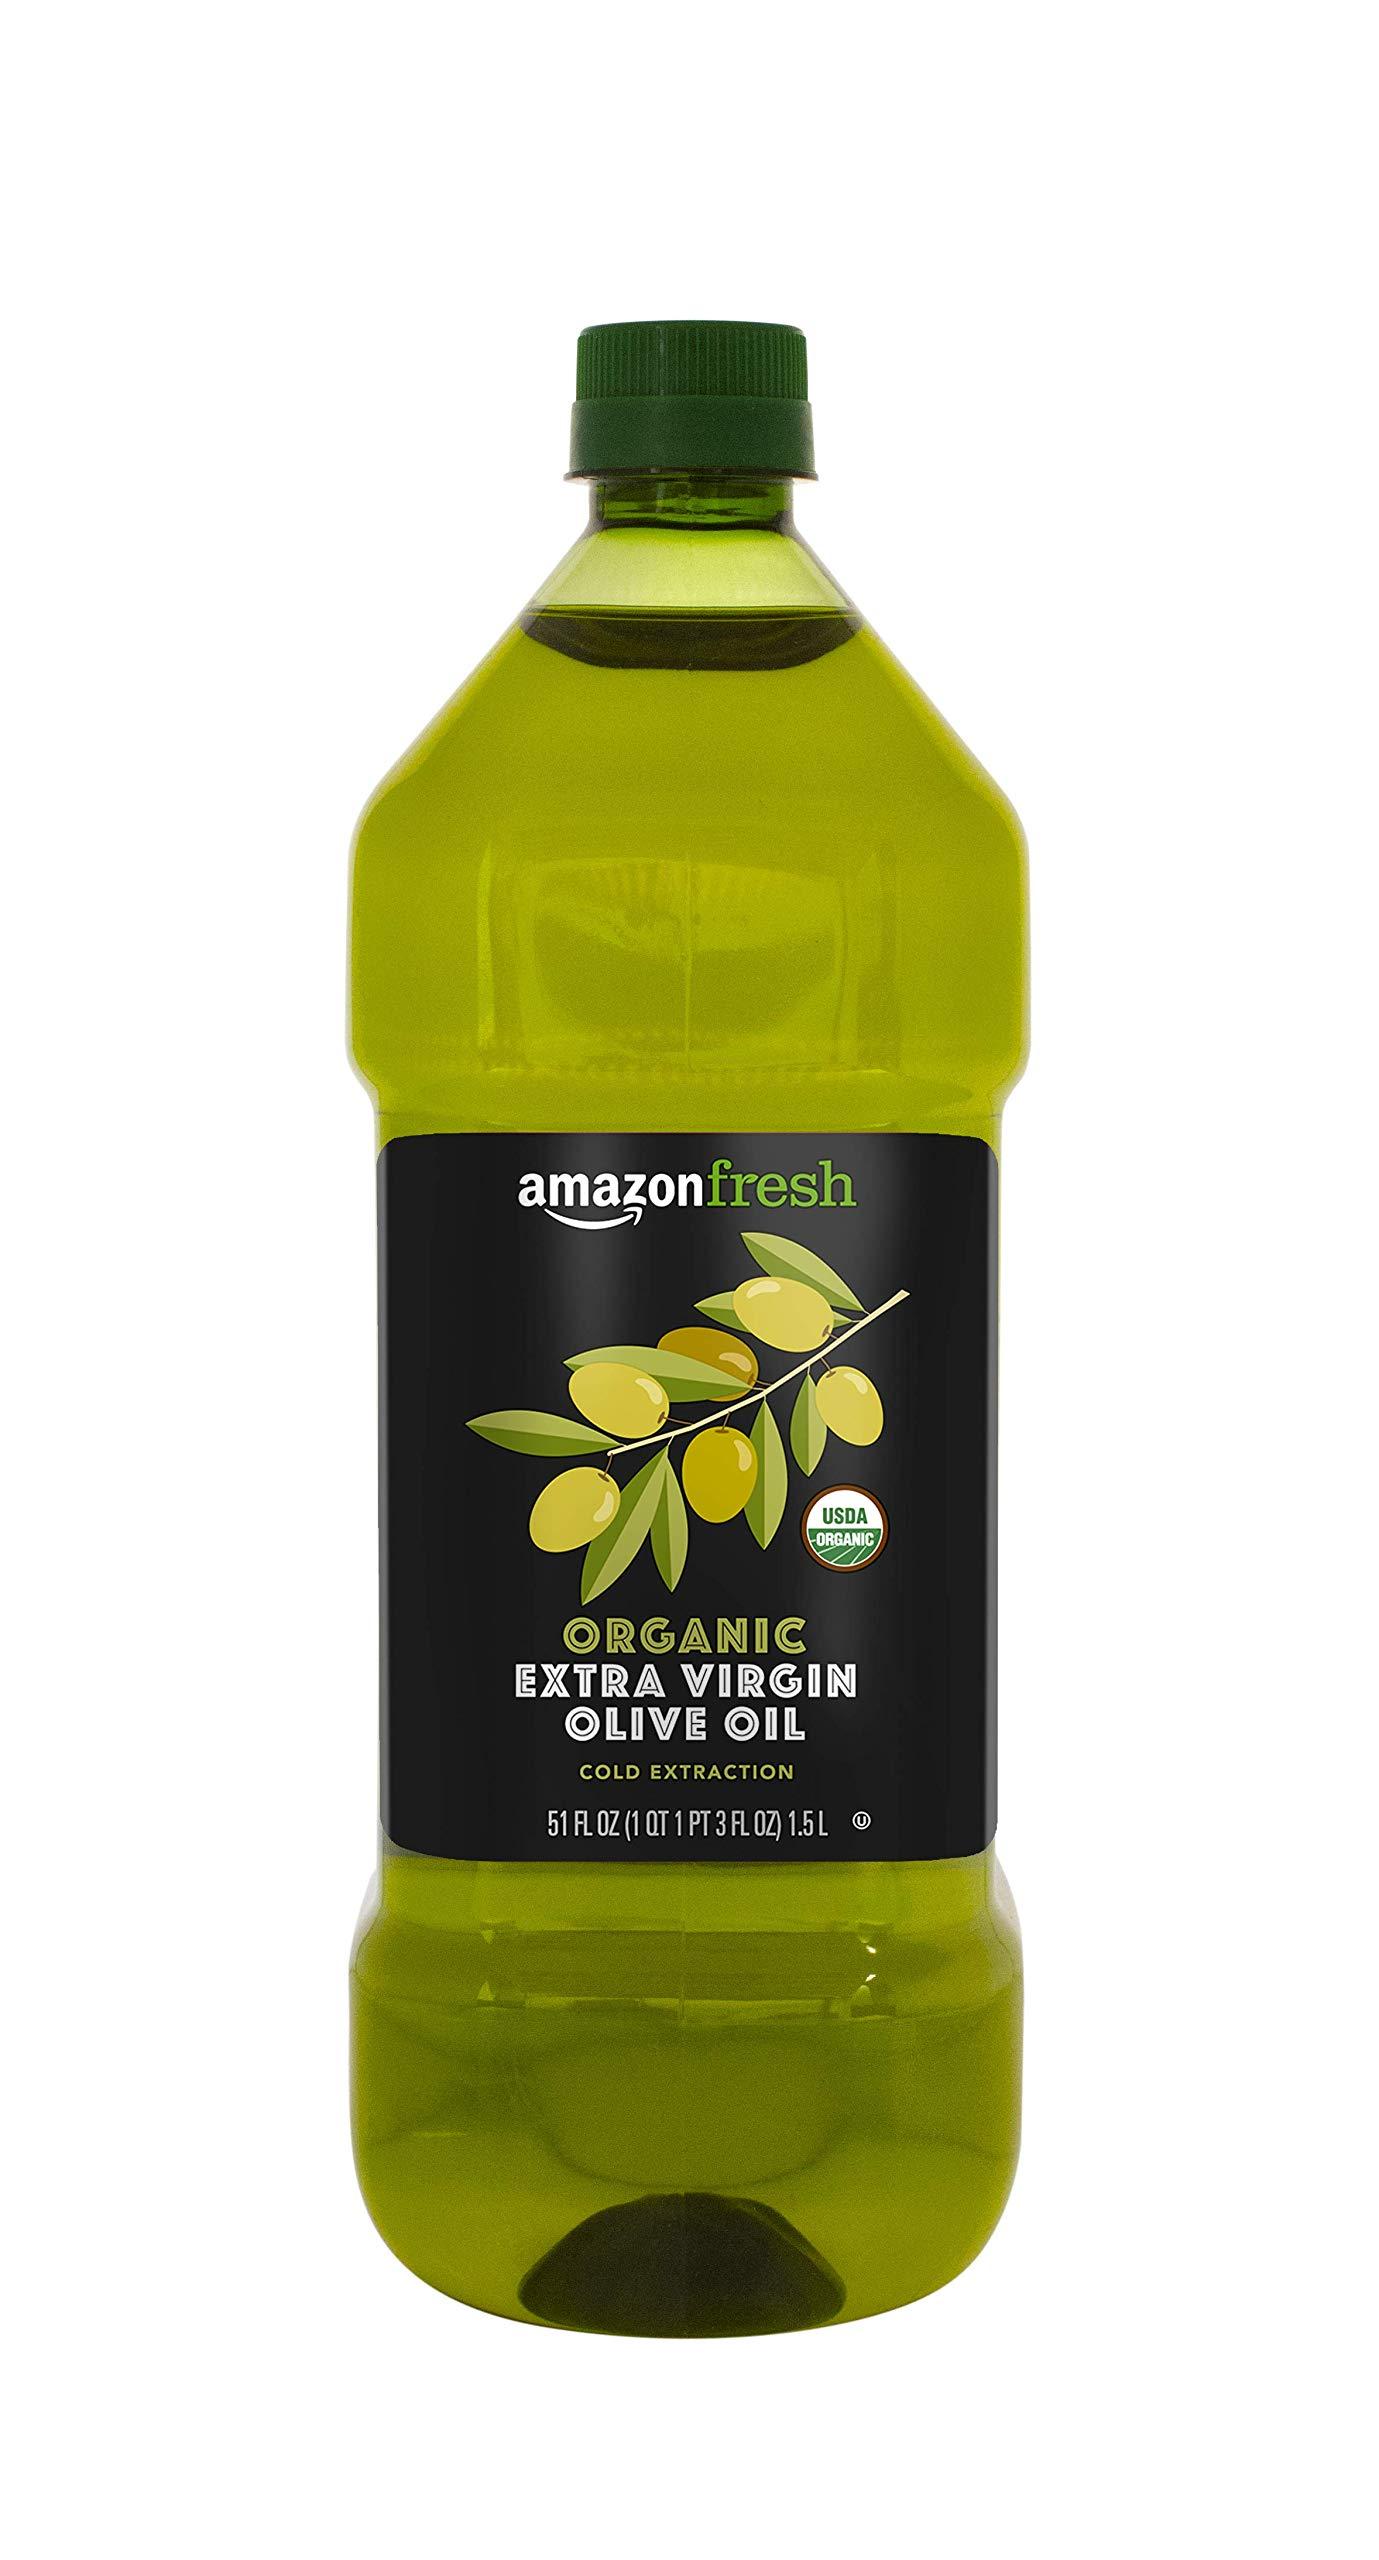 AmazonFresh Organic Extra Virgin Olive Oil, 1.5L (51 fl.oz.)